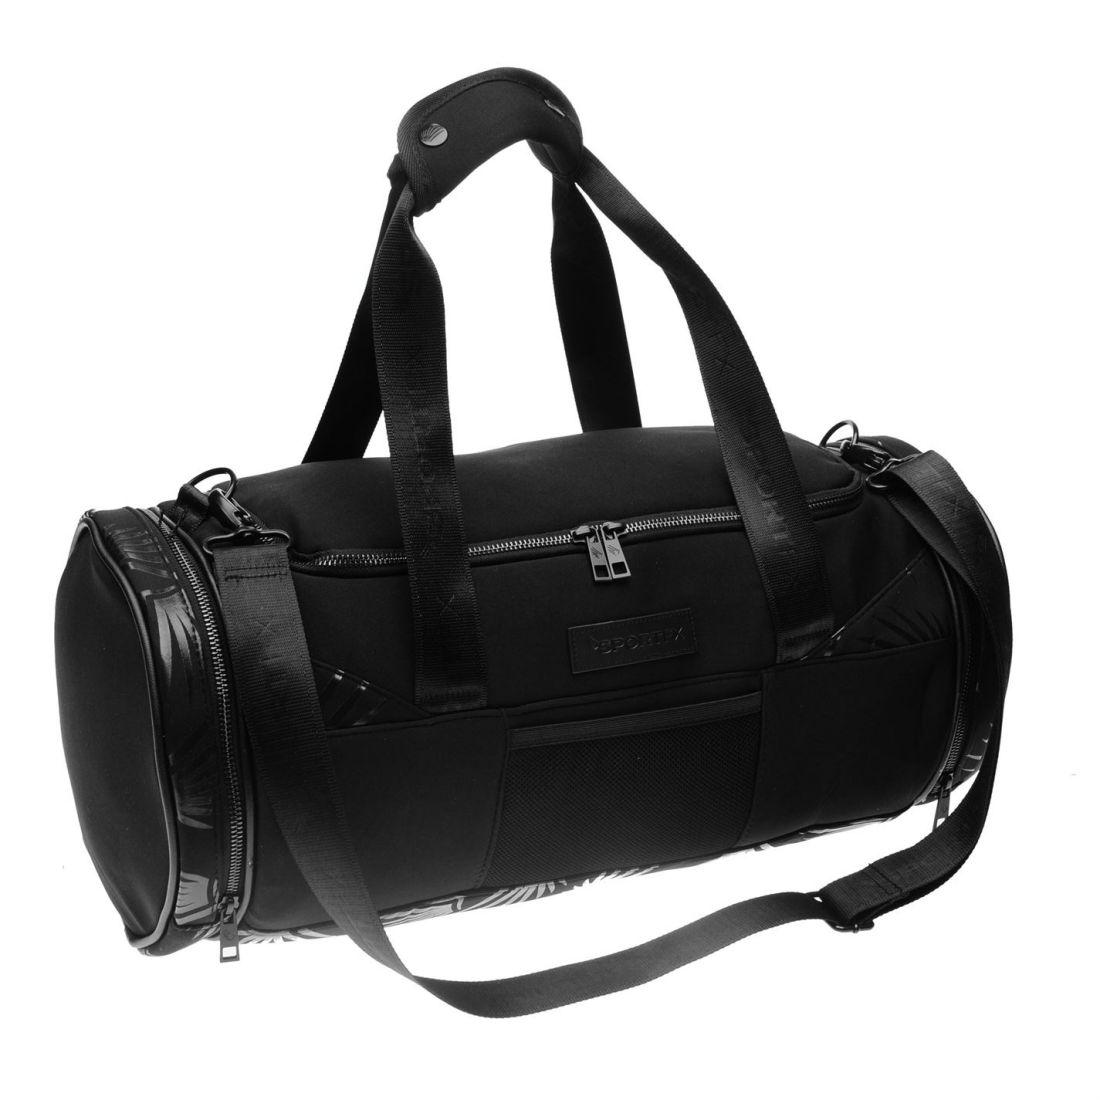 9603ebd20d4 SportFX Womens Gym Bag Barrel Sport 5057816191496 | eBay